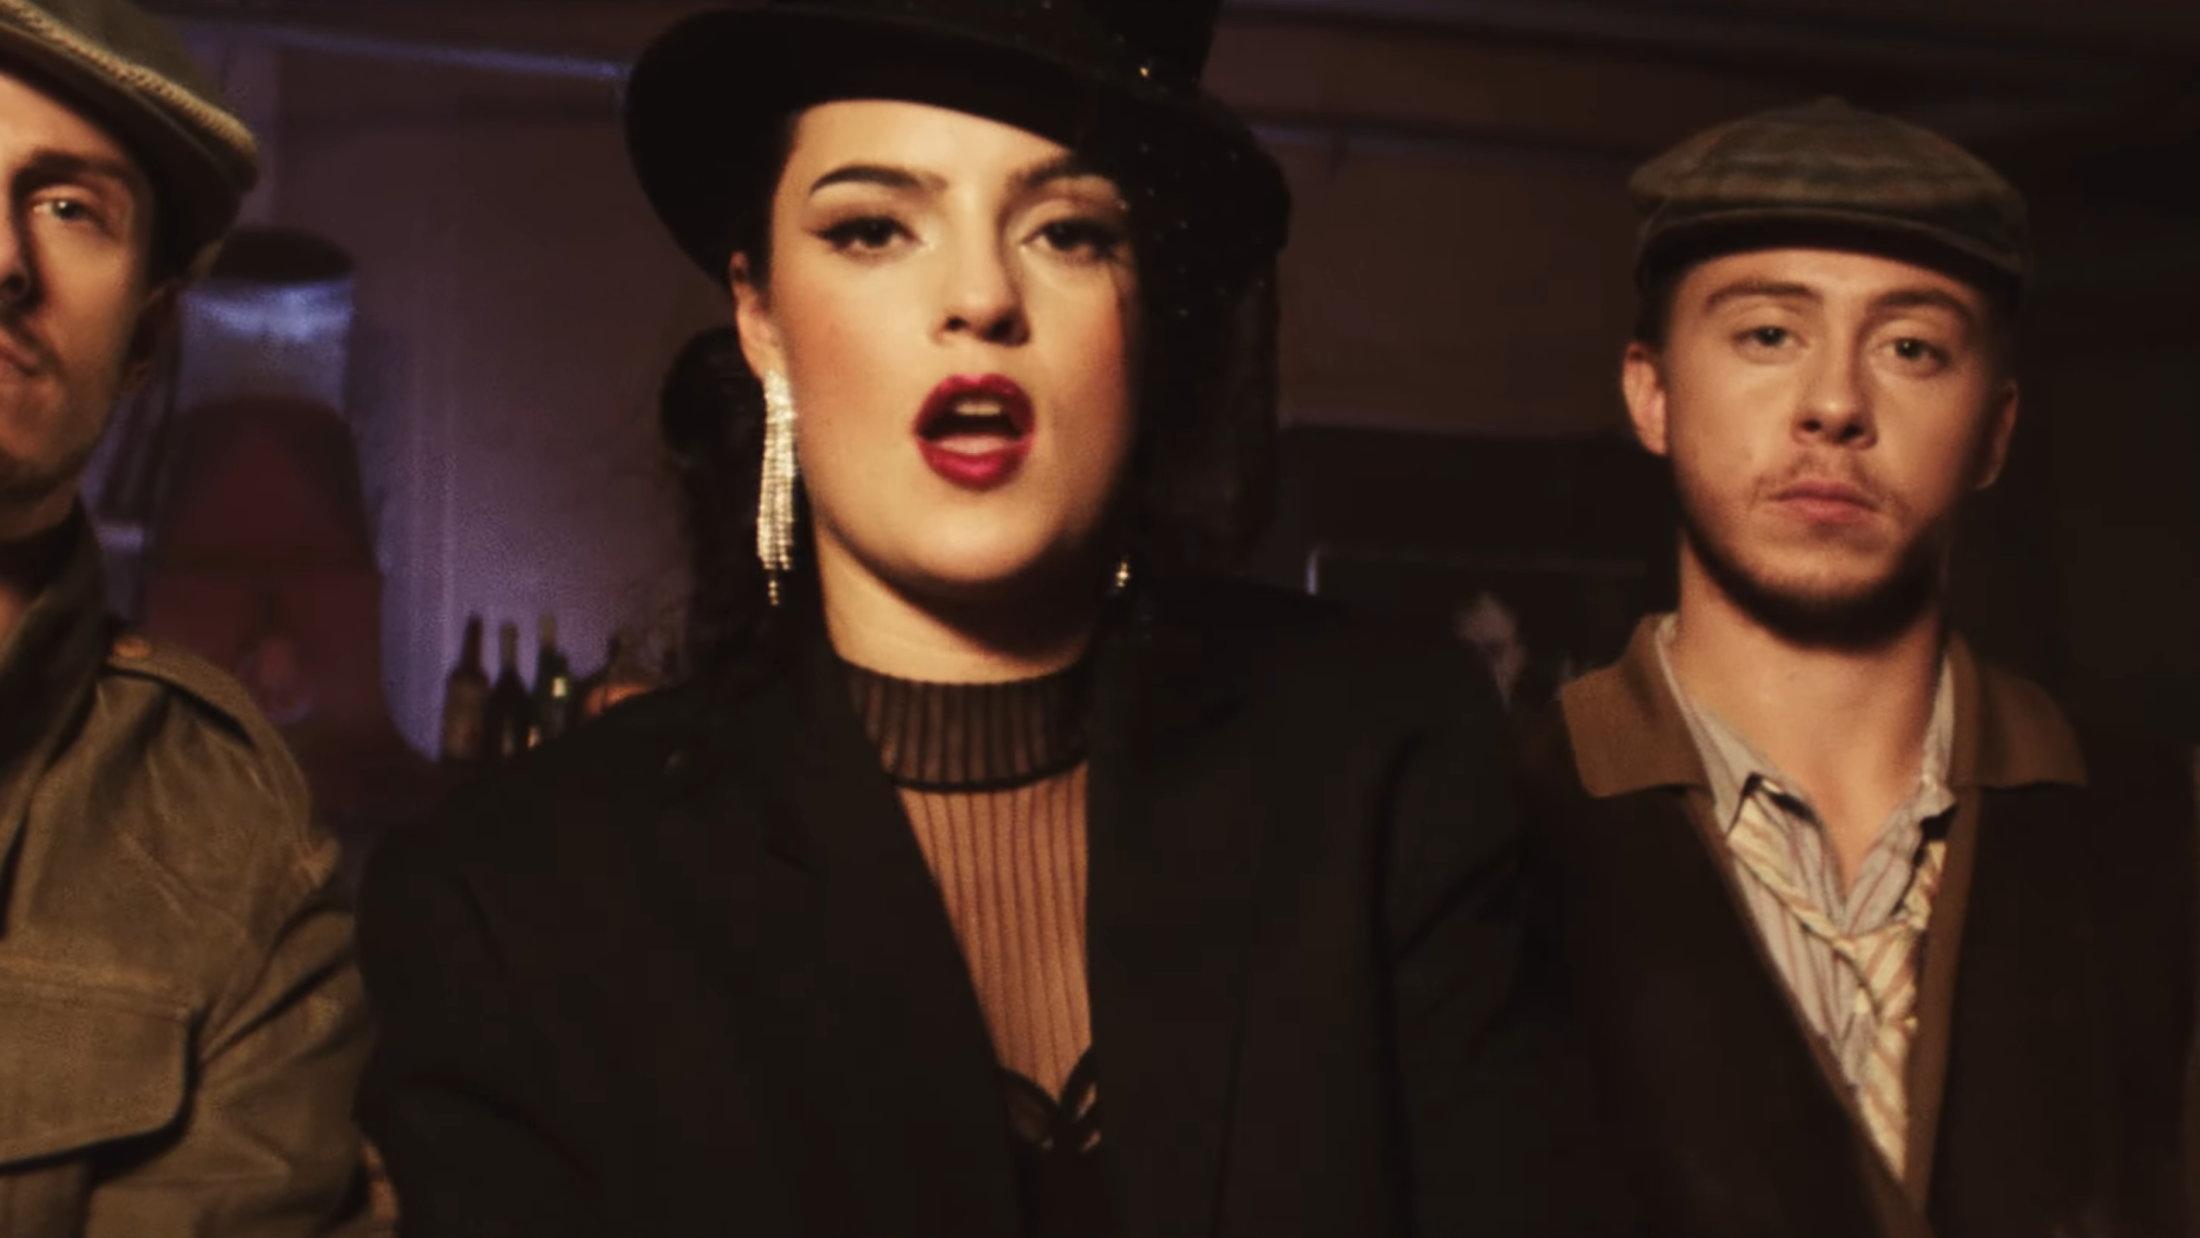 Trombone - AronChupa & Little Sis Nora OFFICIAL VIDEO 1-9 Screenshot